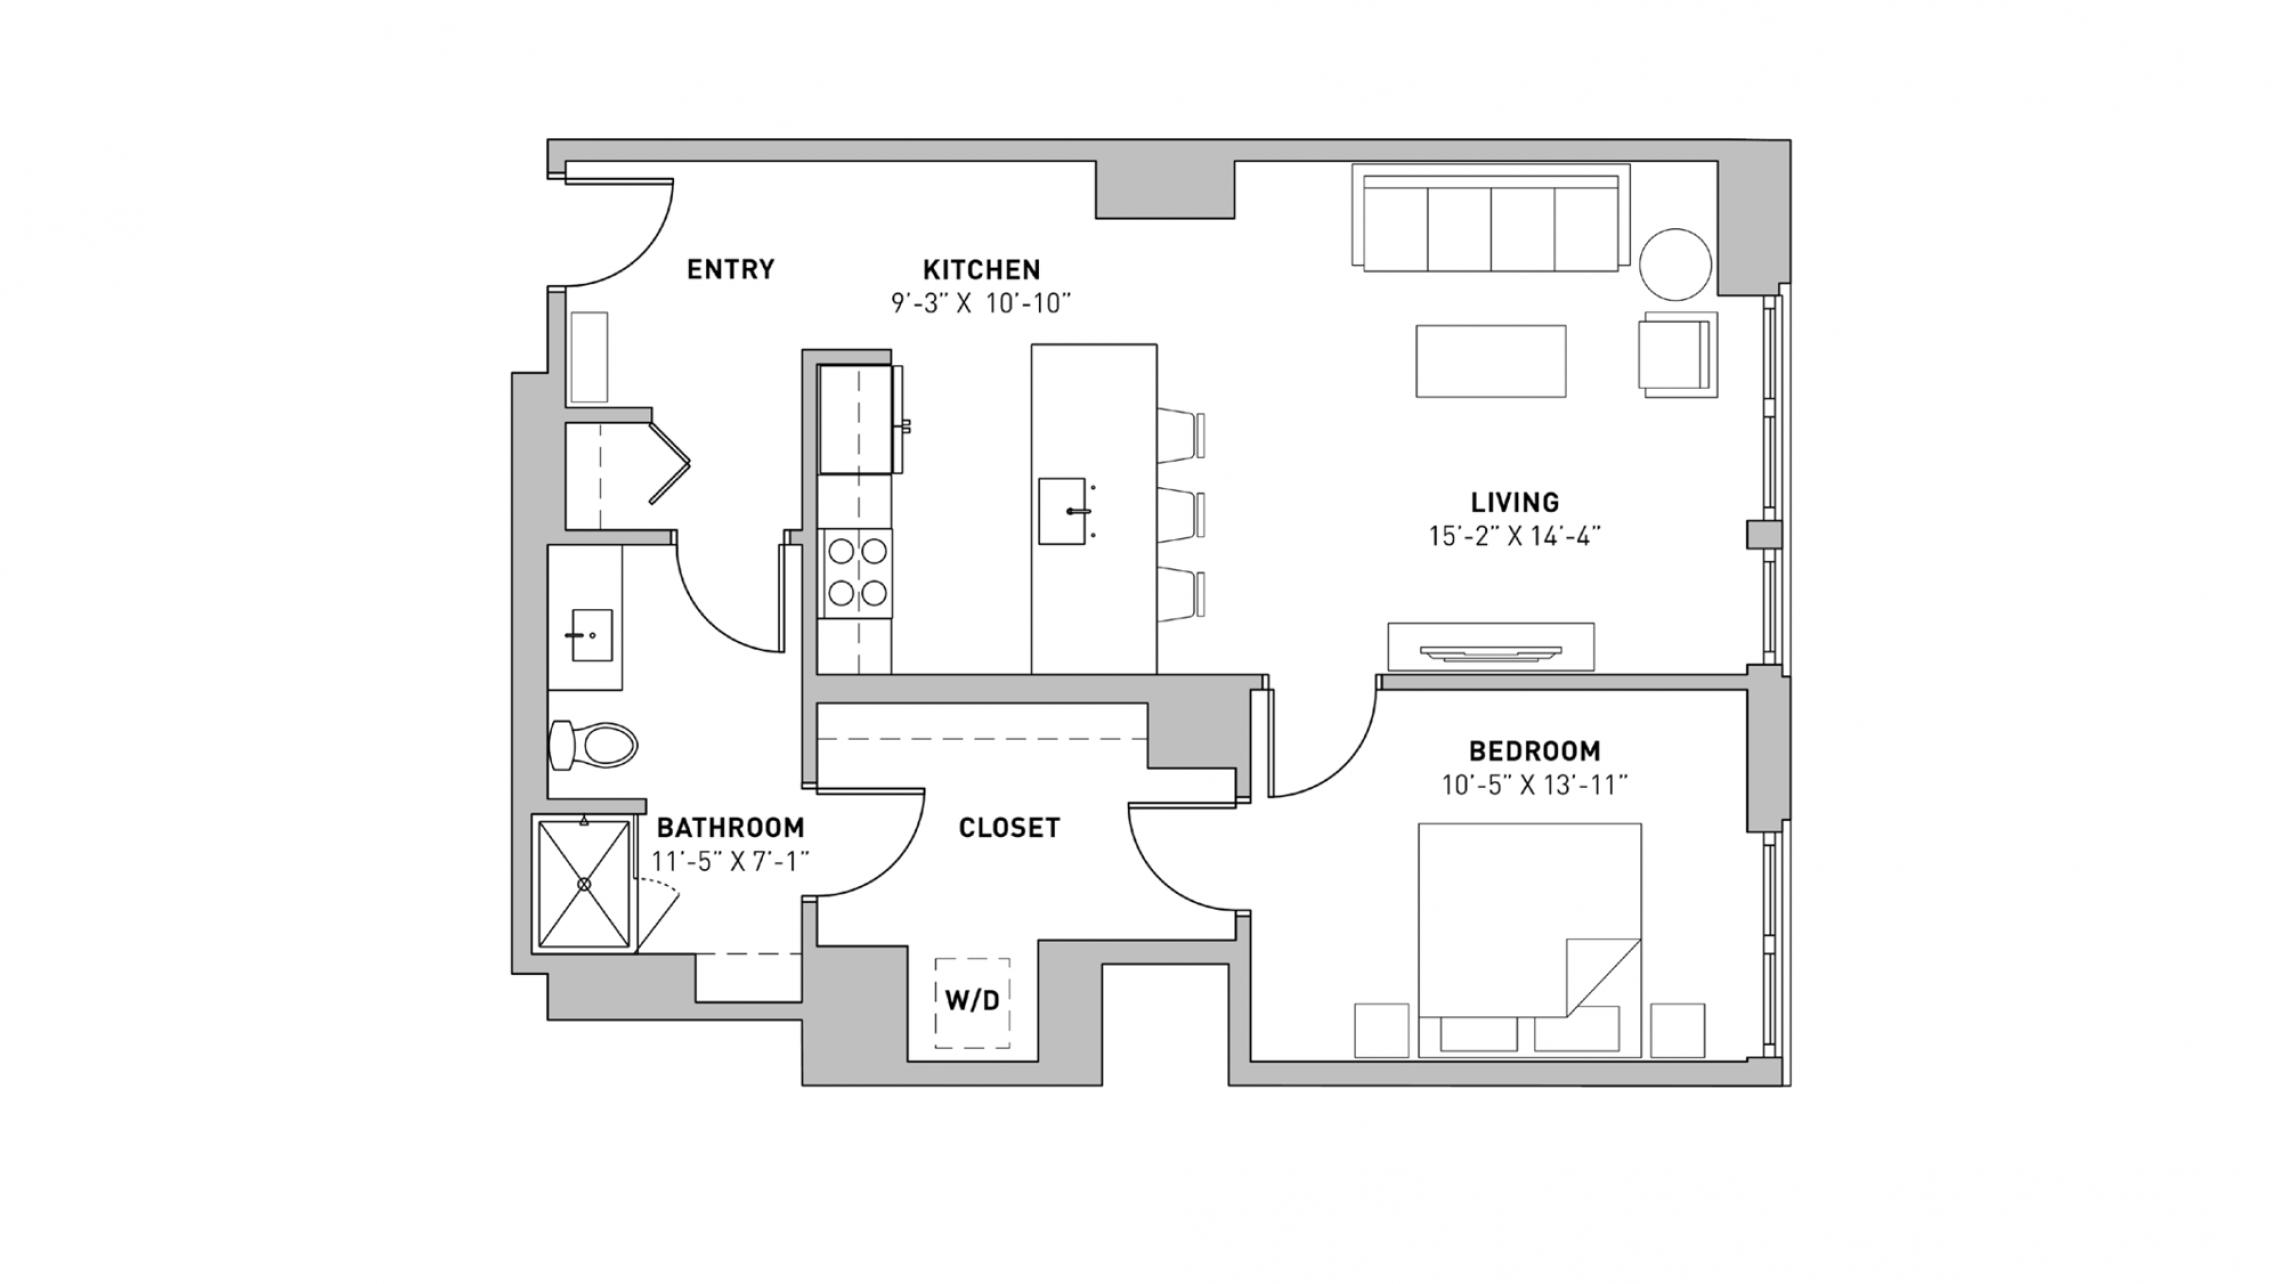 ULI The Pressman 611 - One Bedroom, One Bathroom